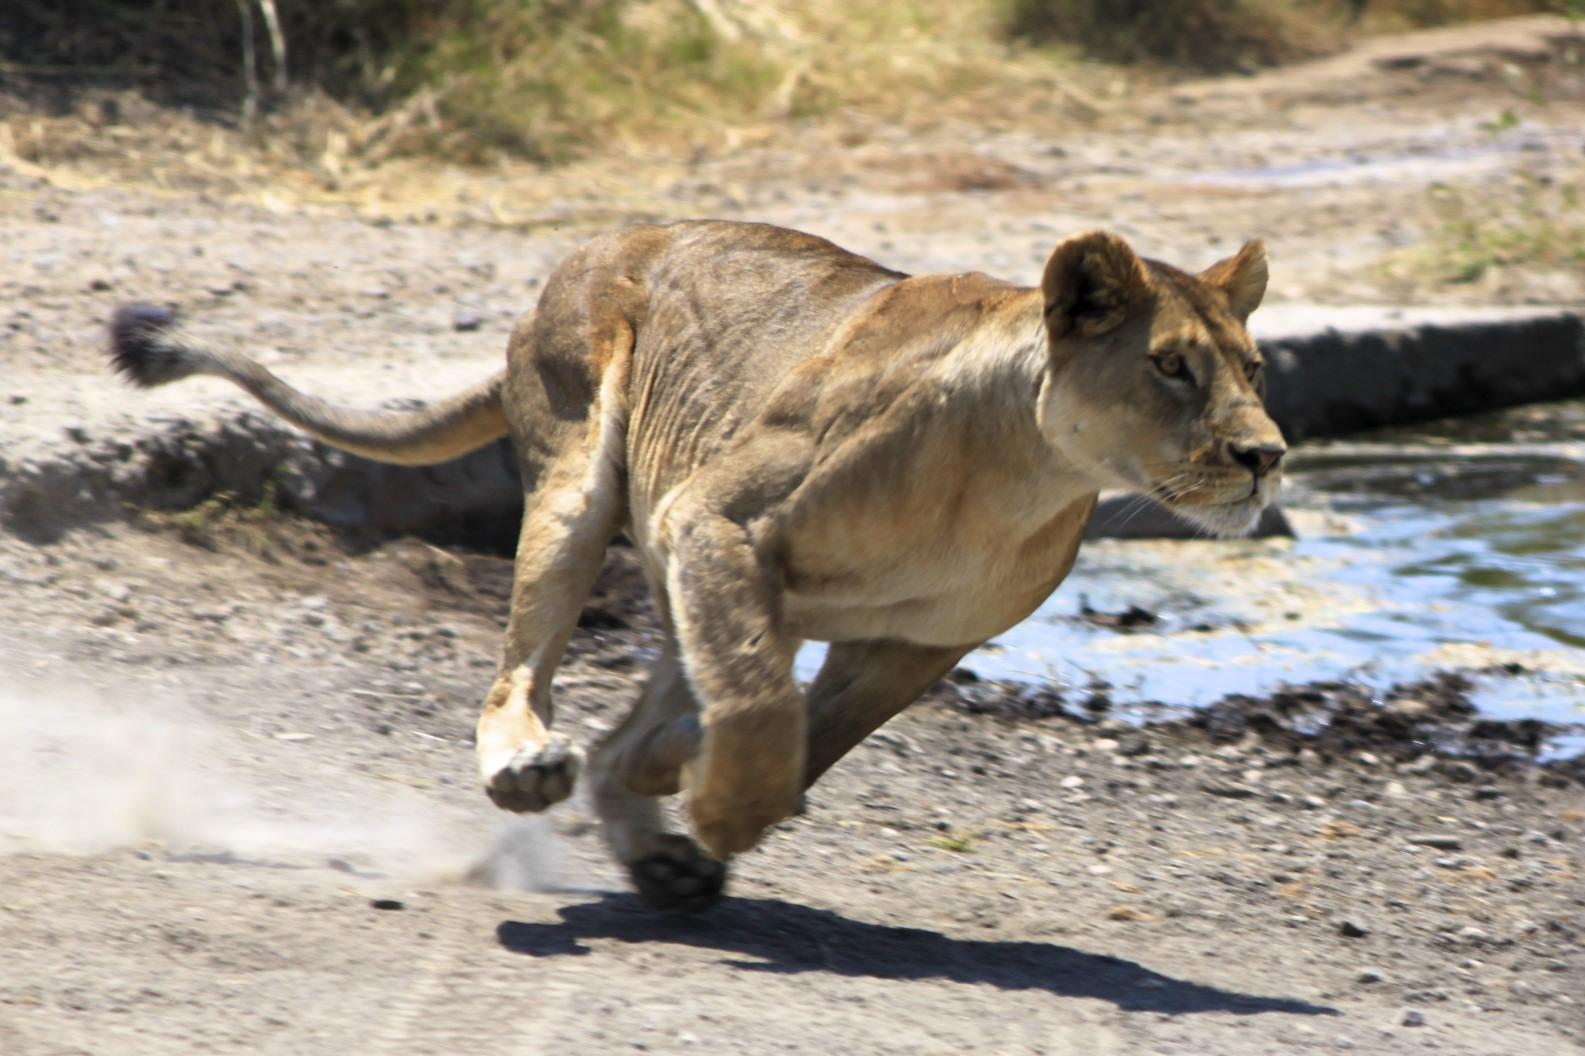 ... in serengeti tripadvisor tanzania5 tripadvisor botswana 4 tripadvisor